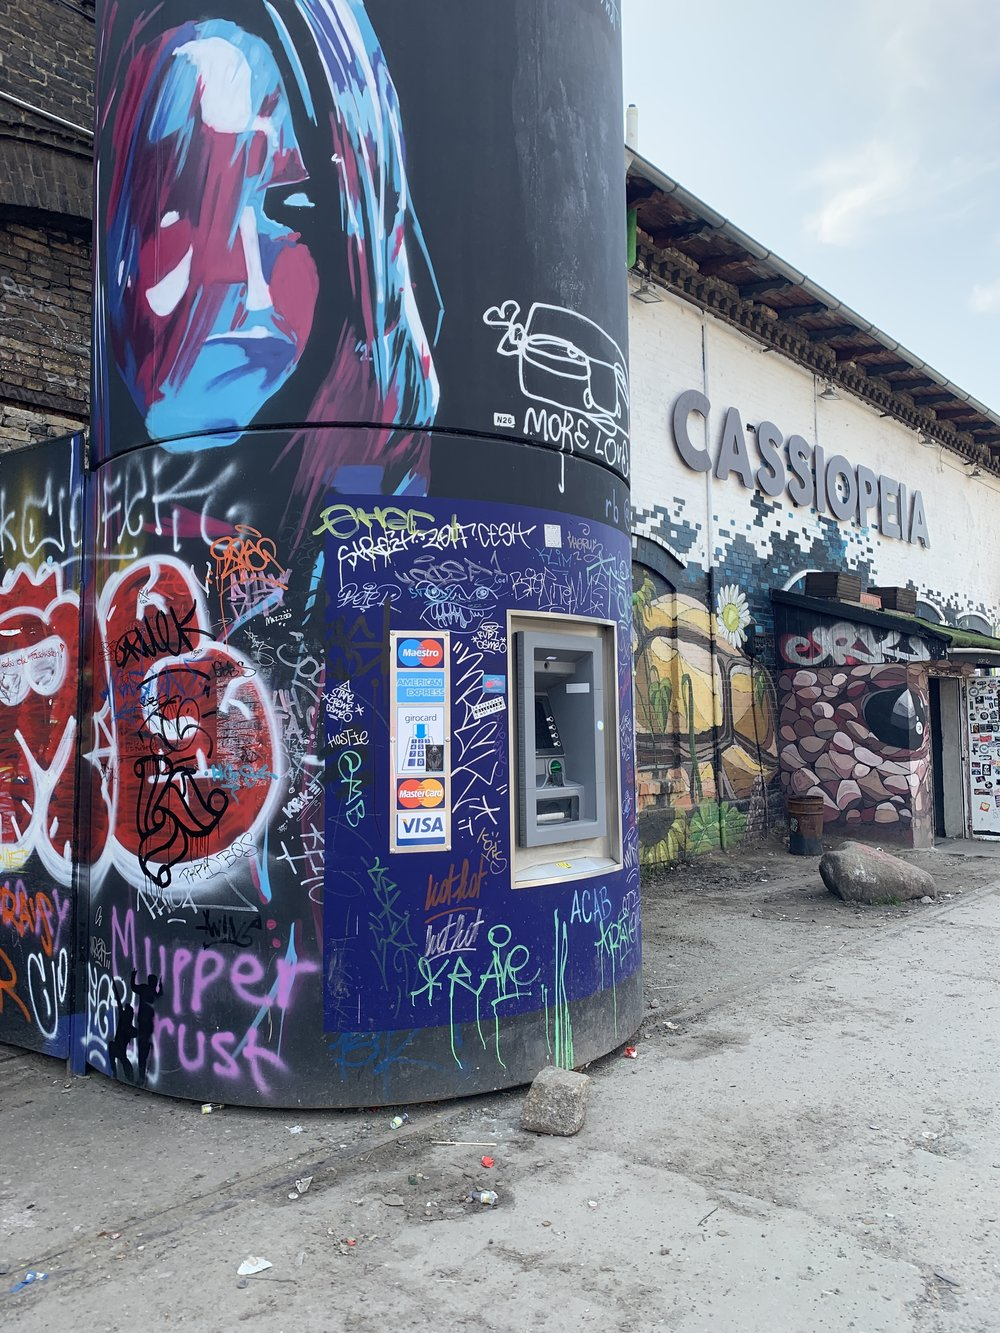 Artsy ATM in the city. Friedrichshain, Berlin.